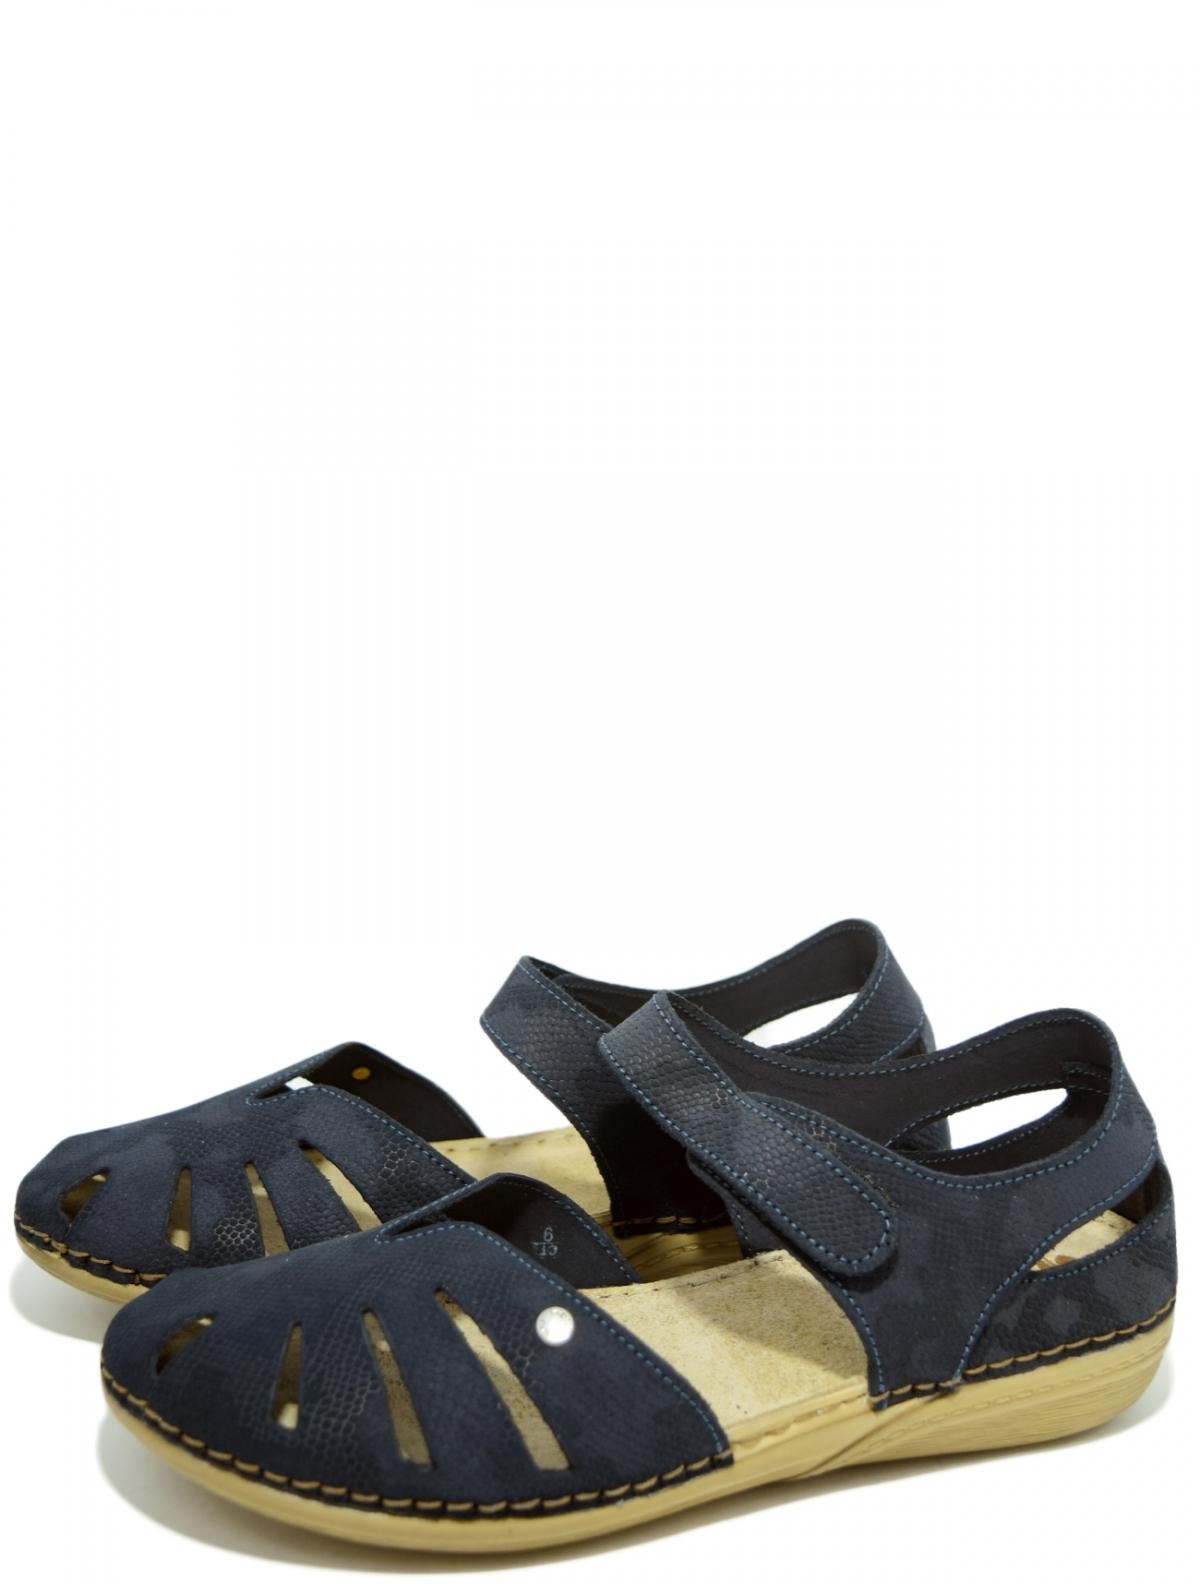 Inblu VC-3A1 женские туфли